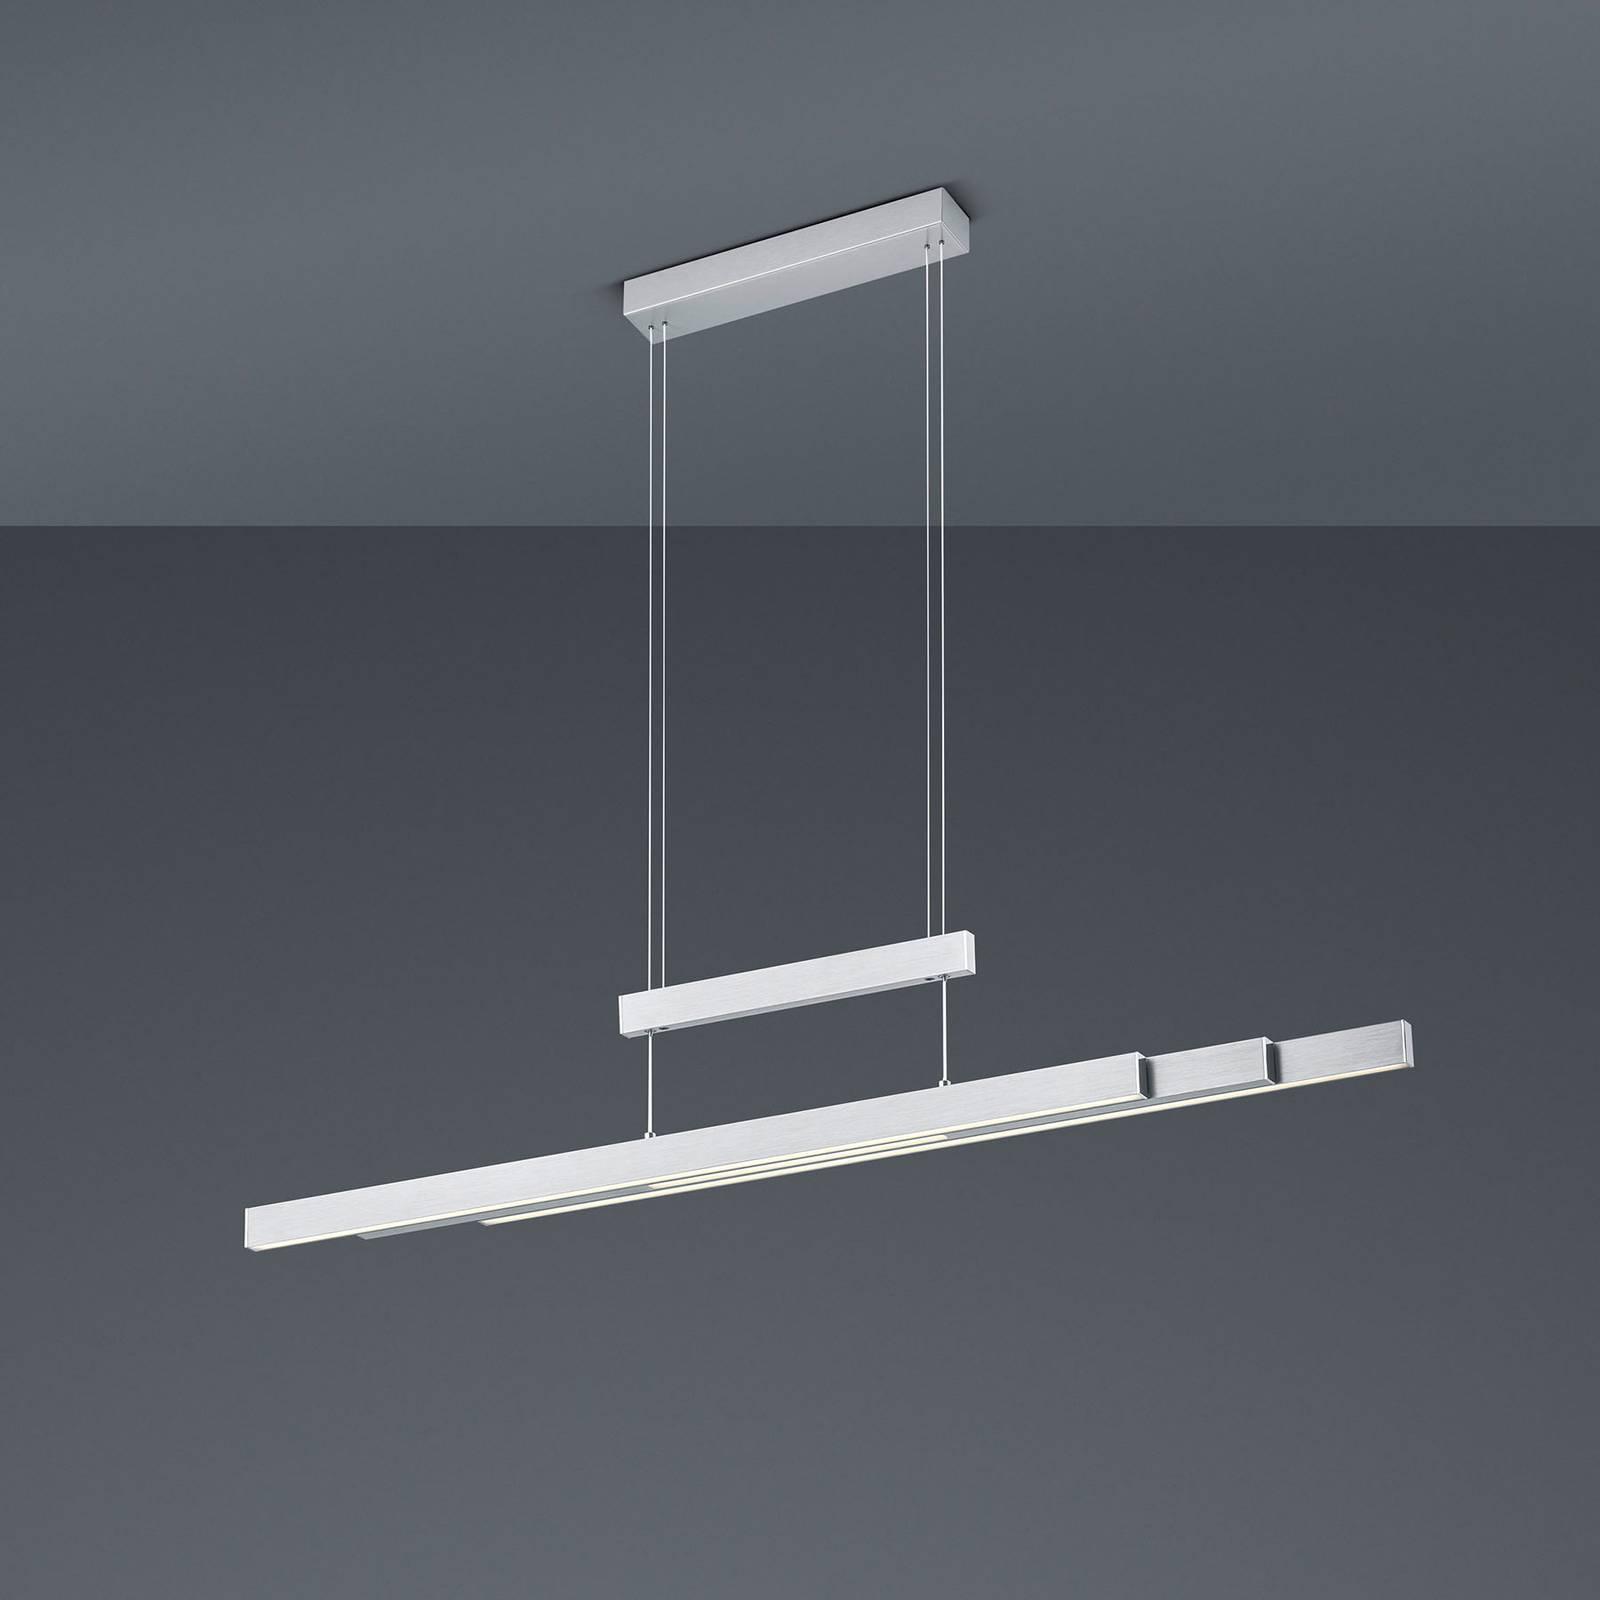 Lampa wisząca LED Trajan, 2700-5000K, nikiel